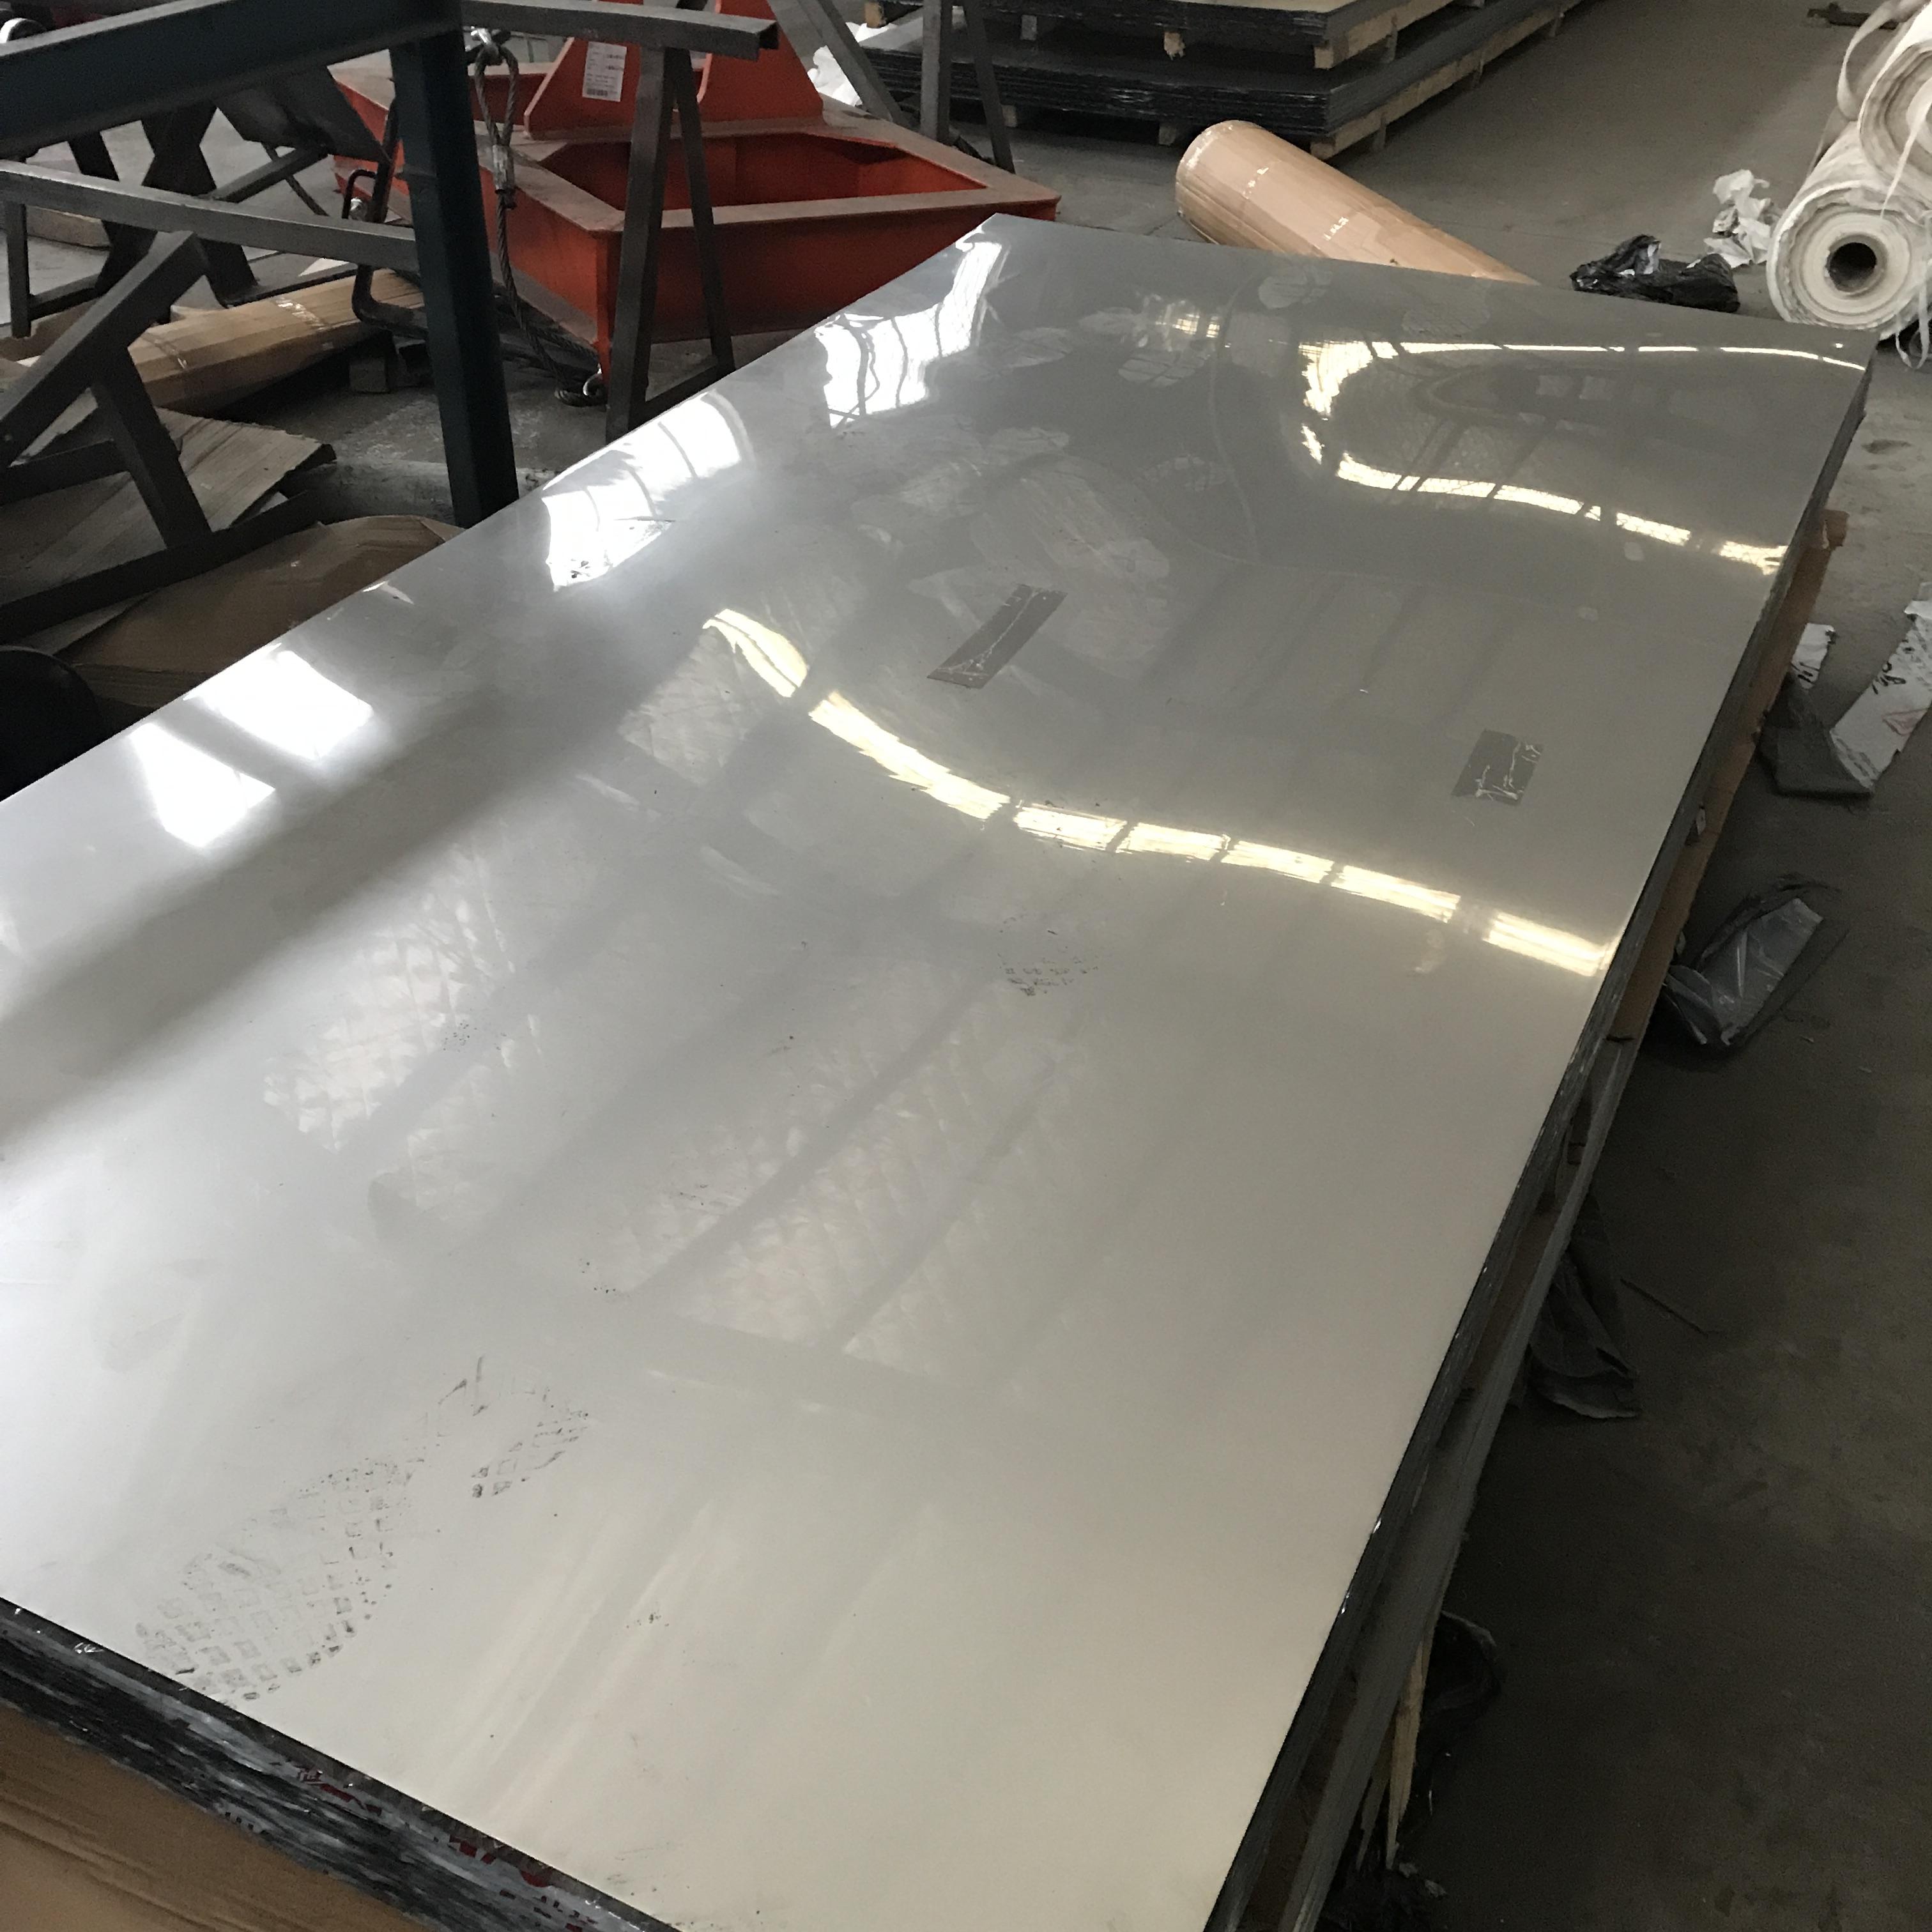 2205 2207 253ma 625 32760 630 17-4ph Plate inox 310 Sus Mumetal Stainless Steel Sheet